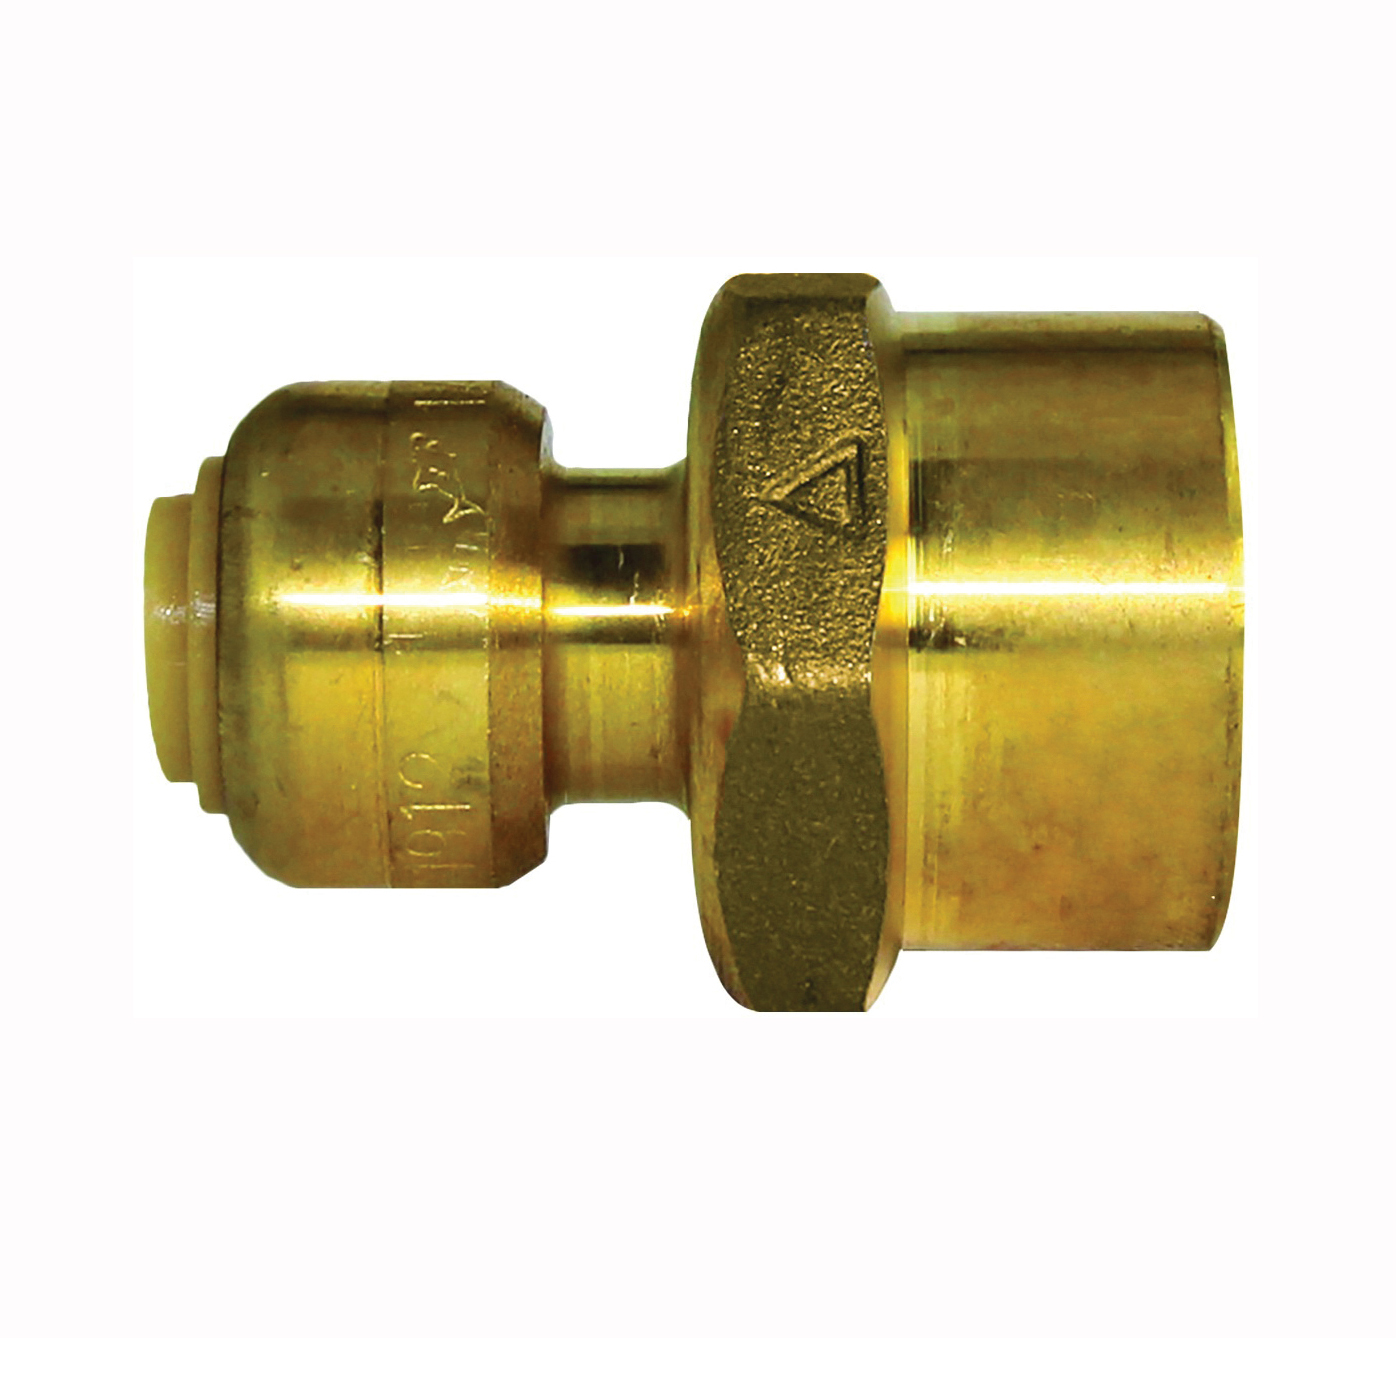 Picture of SharkBite U066LFA Pipe Connector, 1/4 x 1/2 in, FNPT x FNPT, Brass, 200 psi Pressure